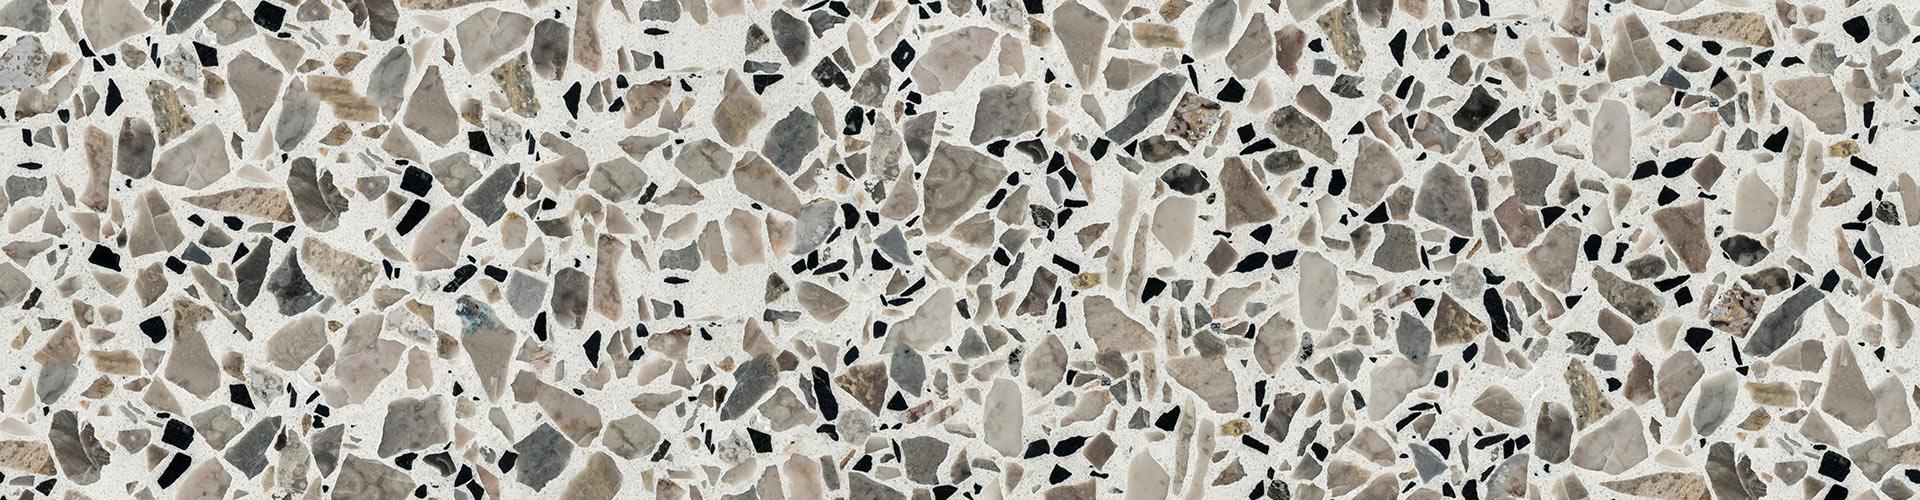 Pangaea flooring texture